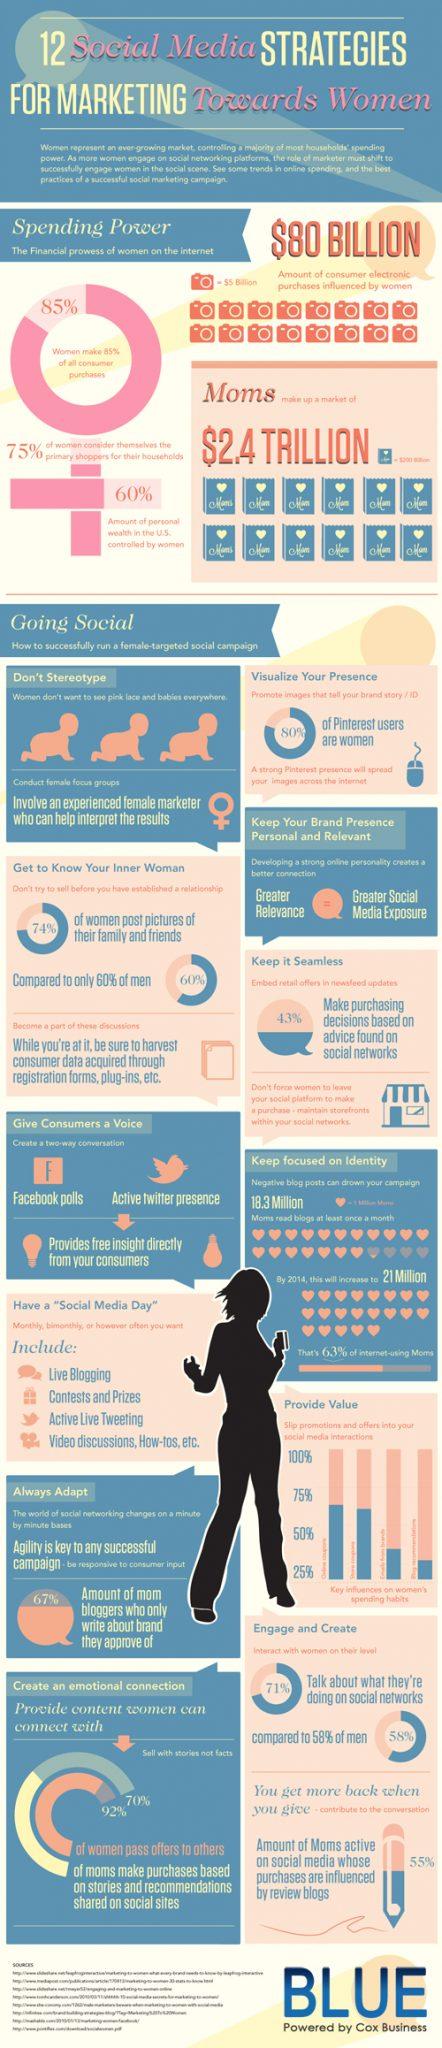 12 Social Media Strategies to Reach Women